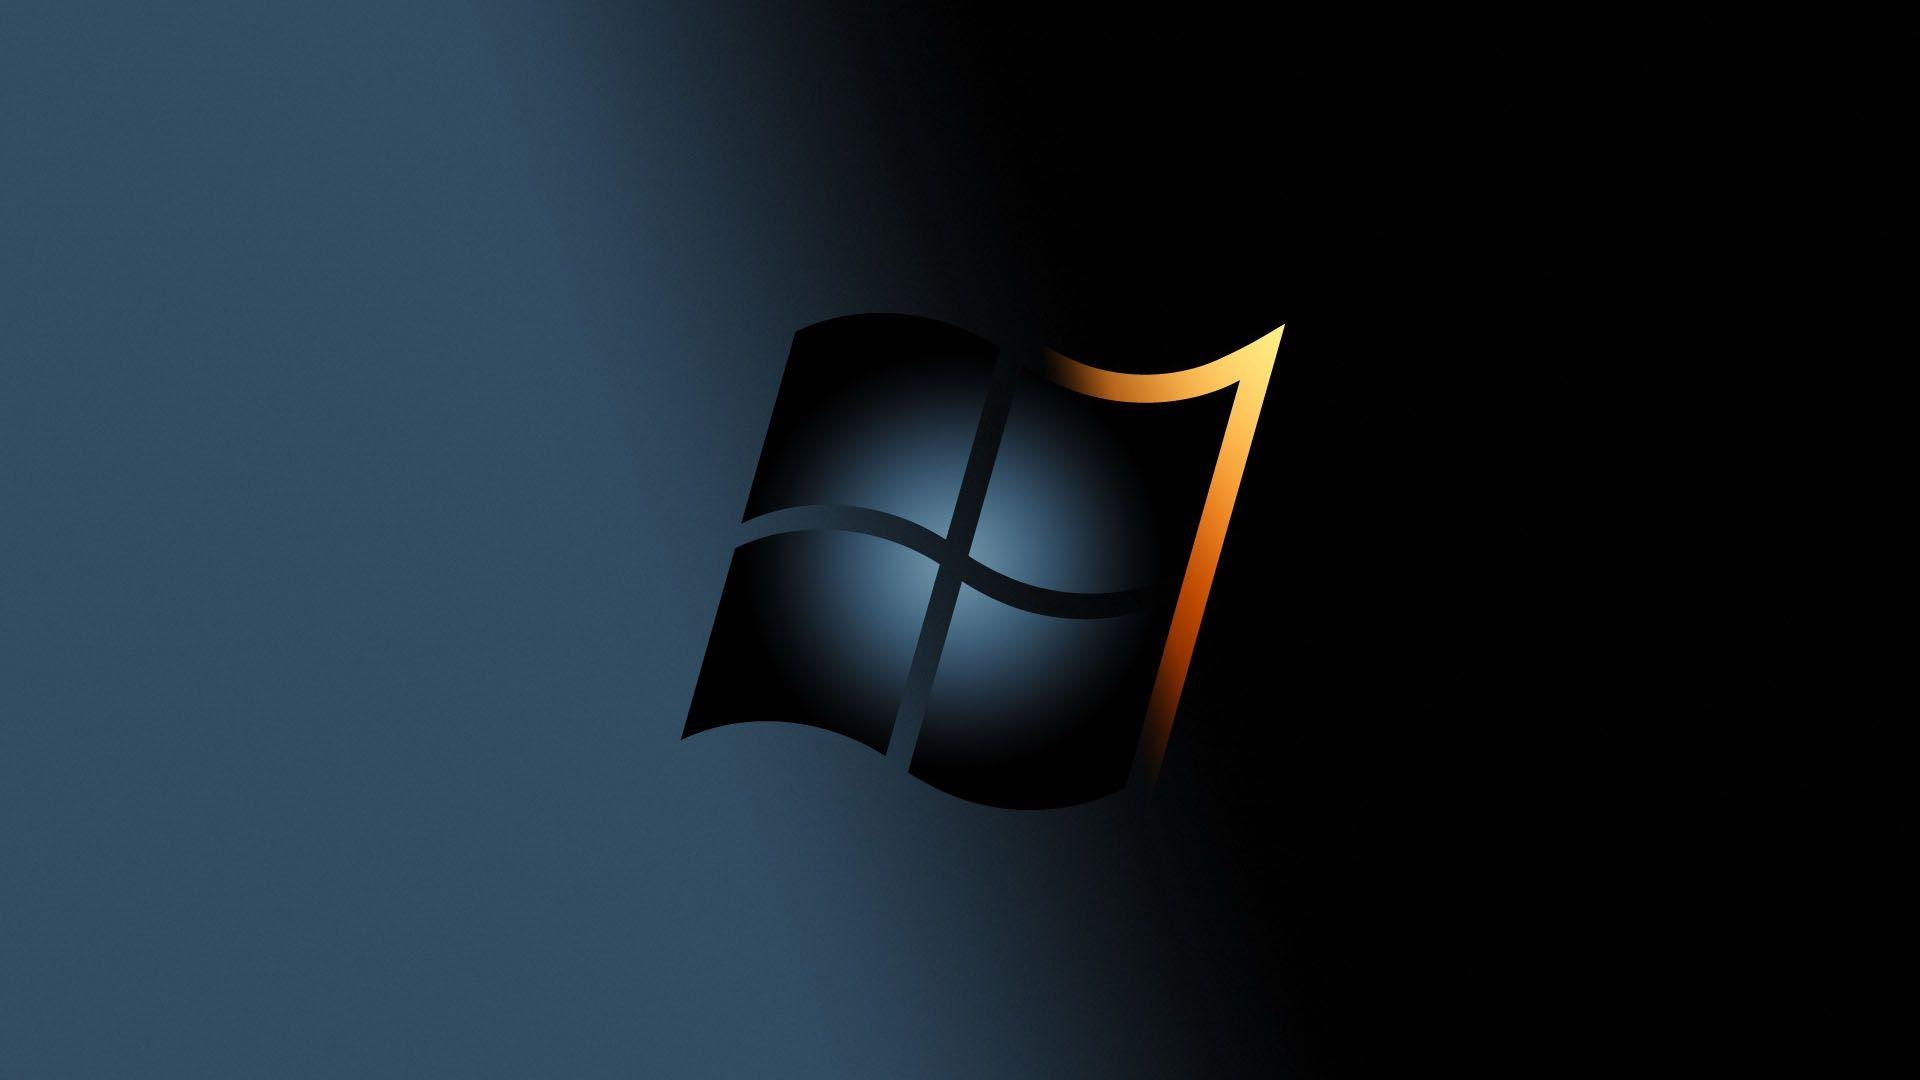 Windows 7 HD Wallpapers 1080p - Wallpaper Cave